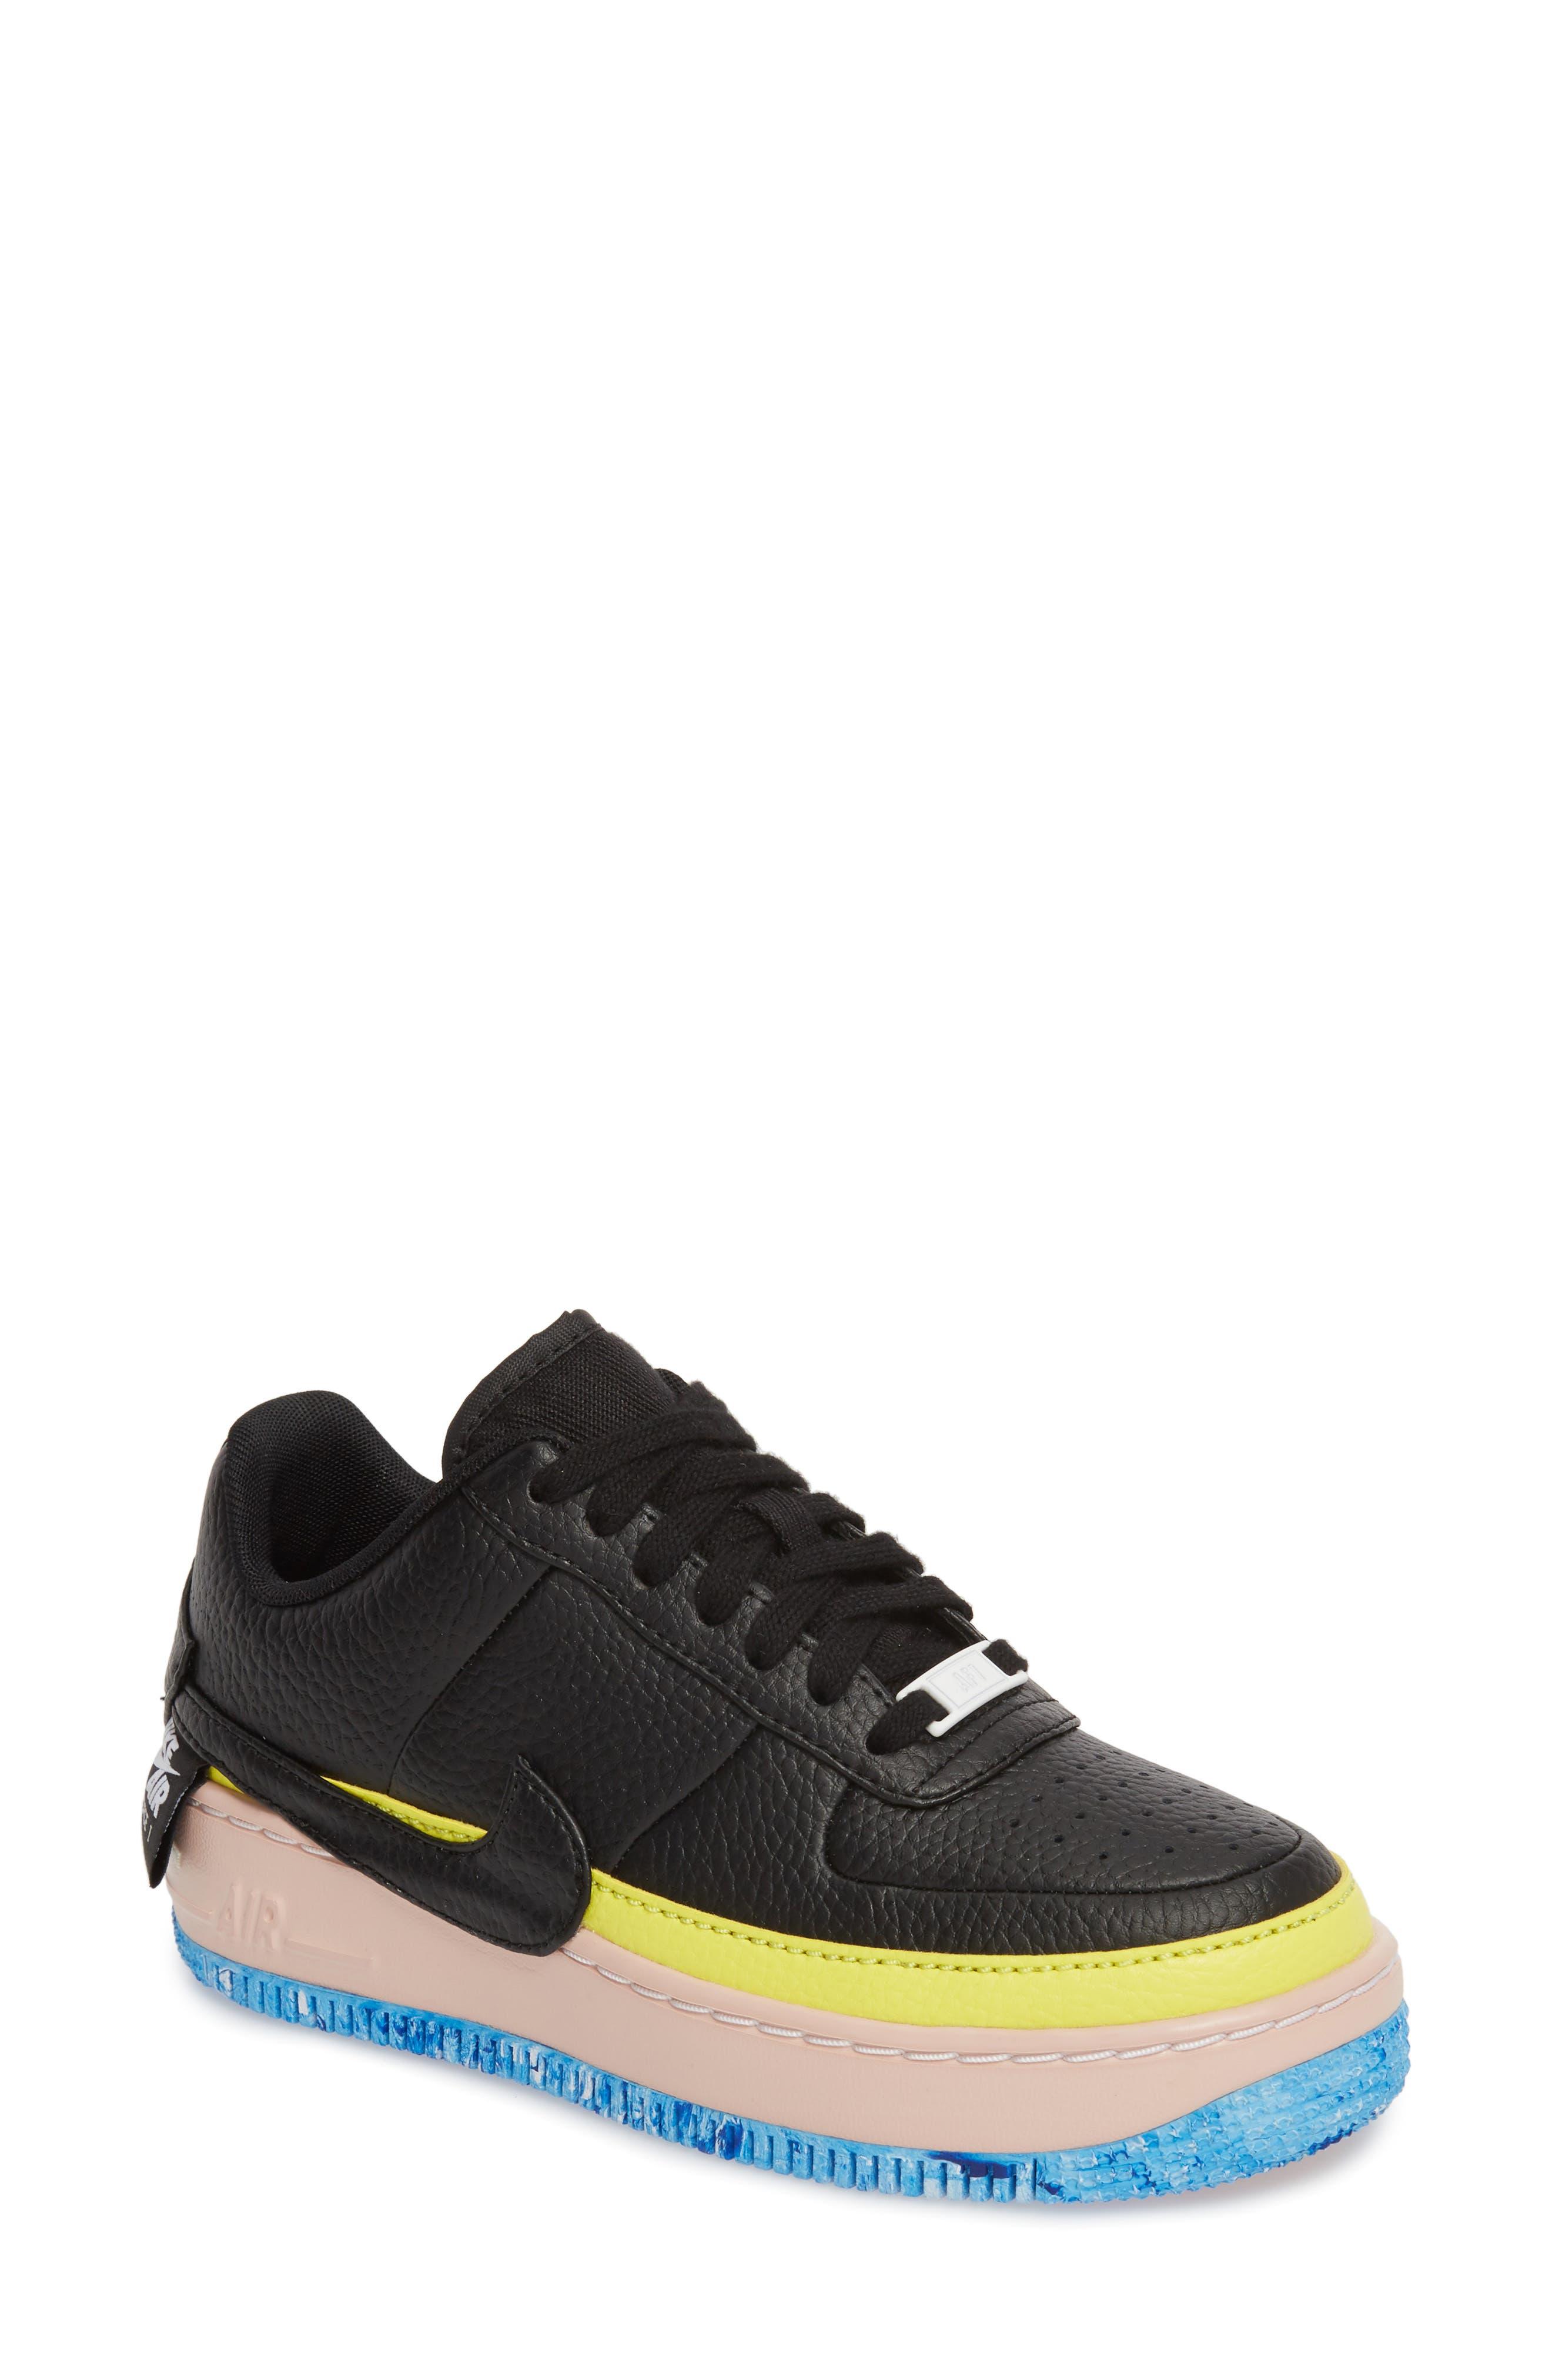 Air Force 1 Jester XX Sneaker,                             Main thumbnail 1, color,                             BLACK/ SONIC YELLOW/ ORANGE